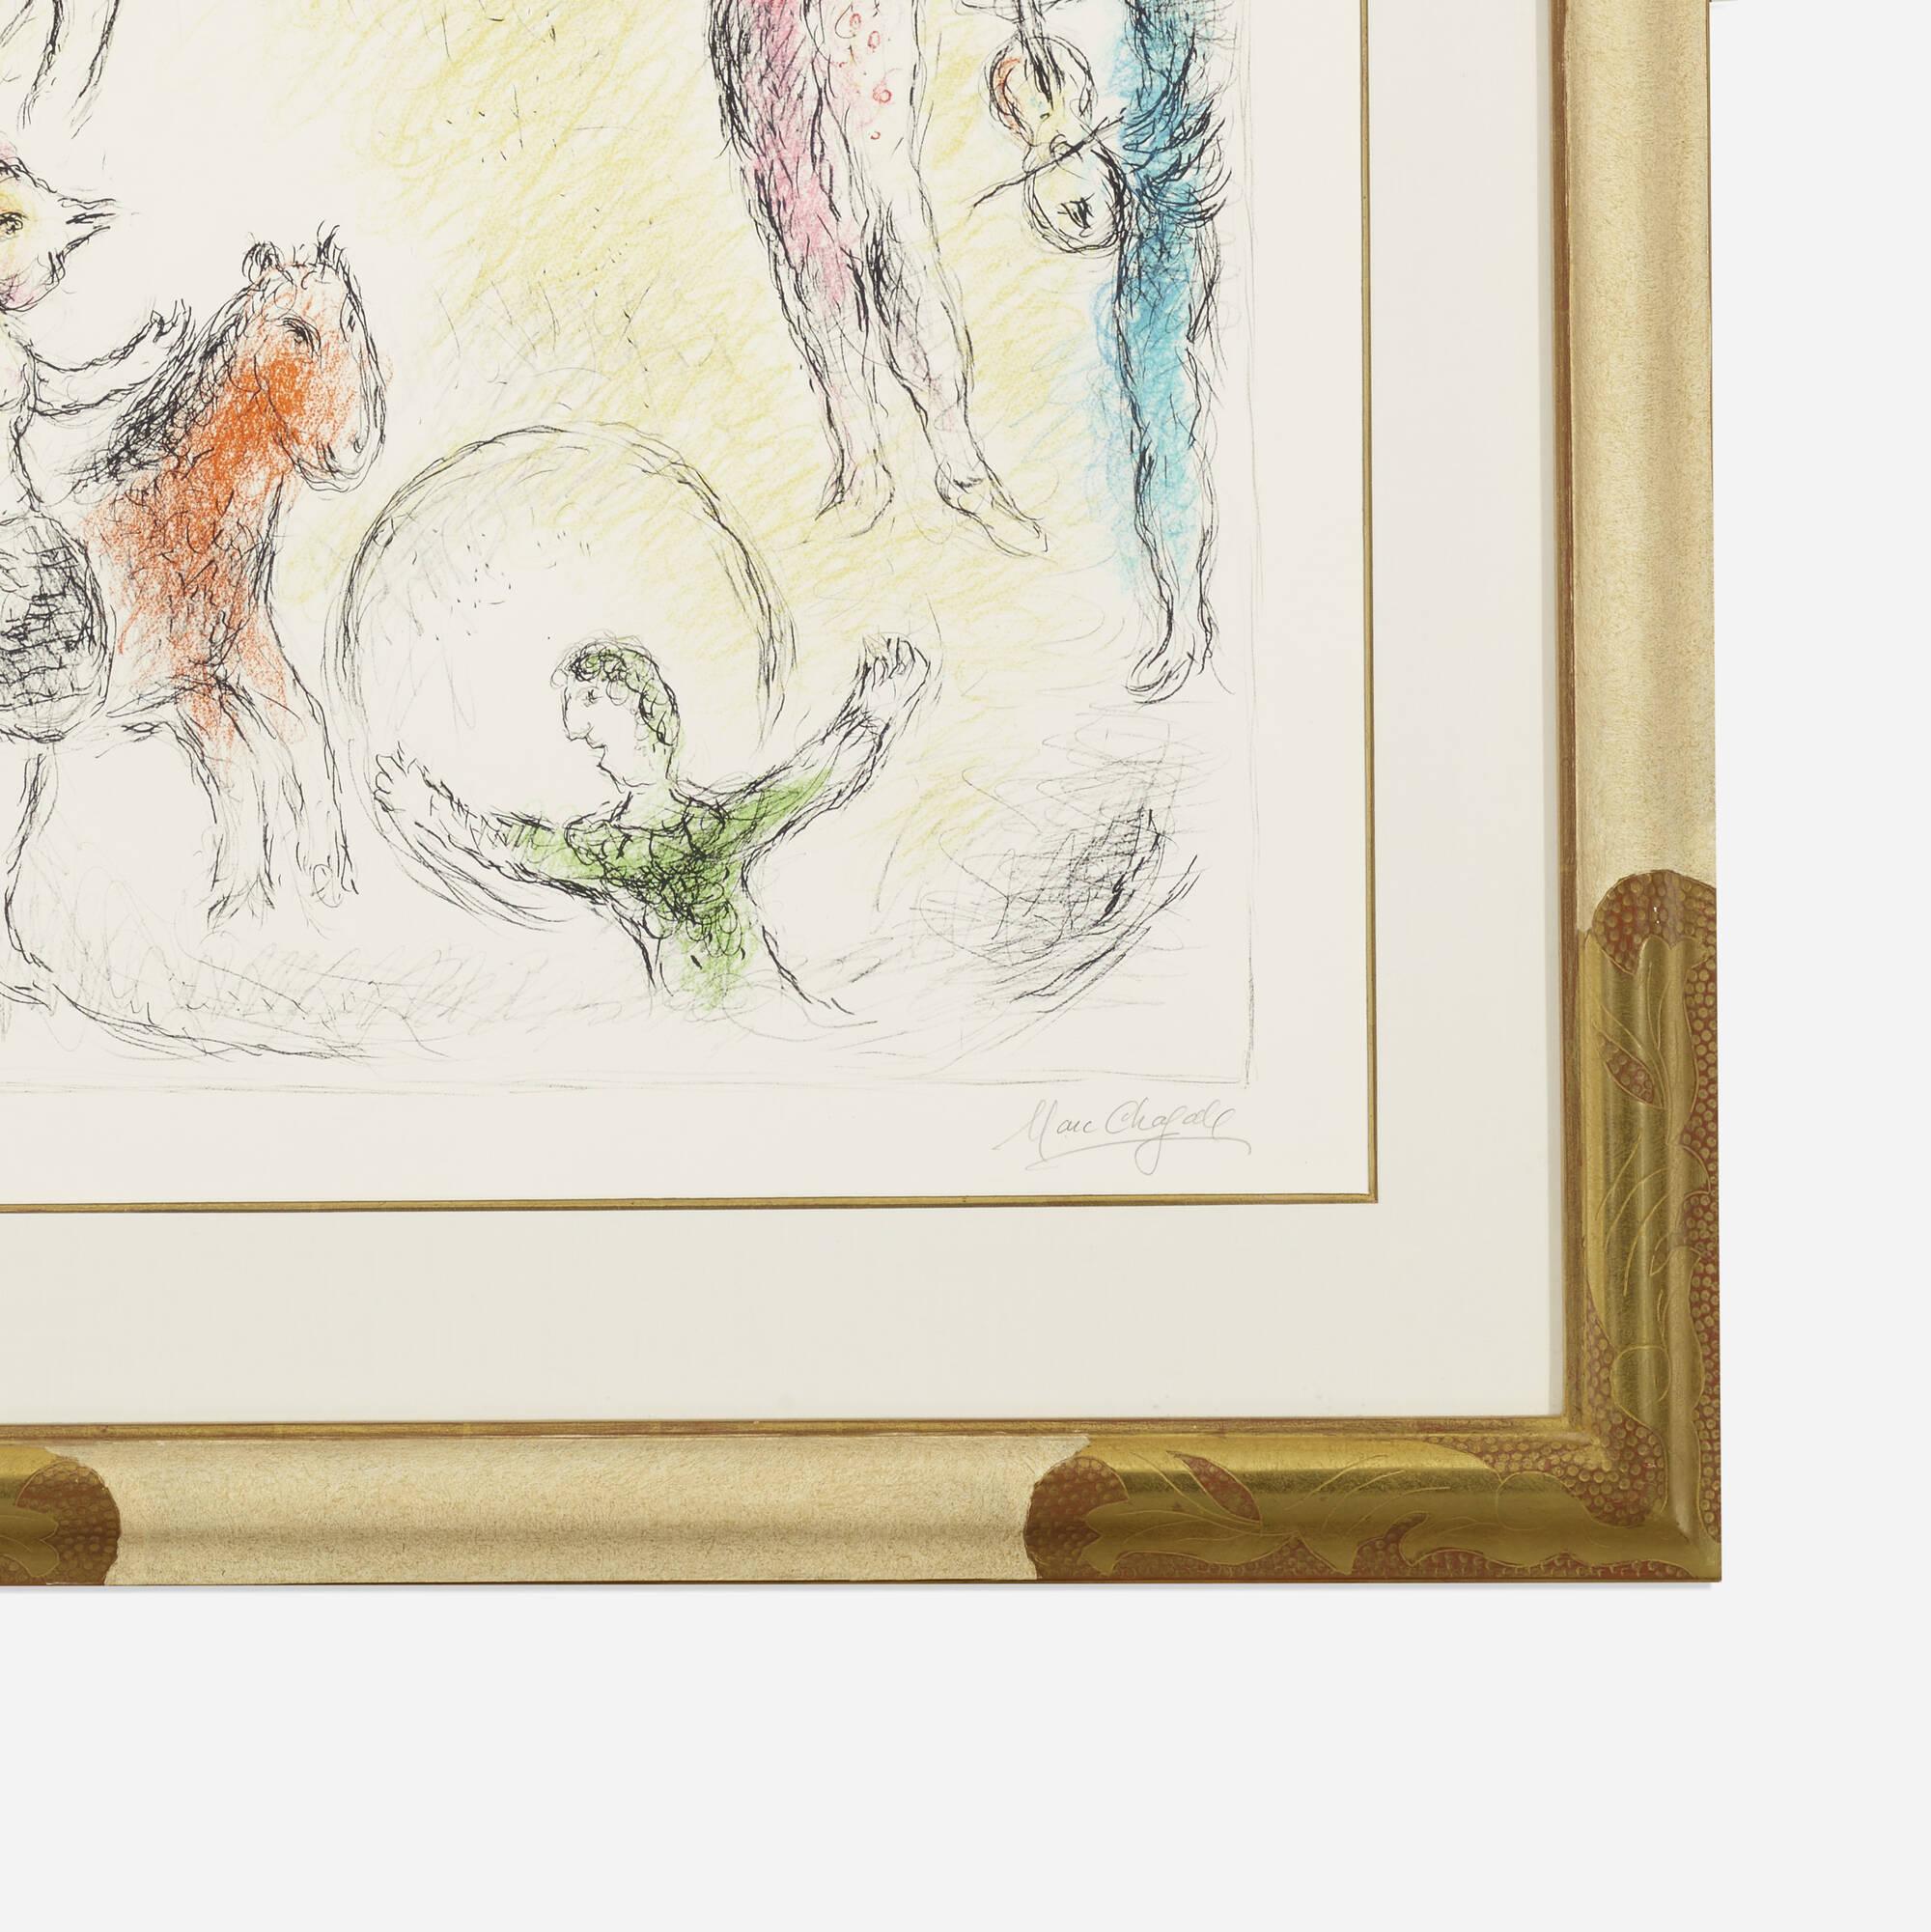 195: Marc Chagall / Musical Clowns (2 of 2)